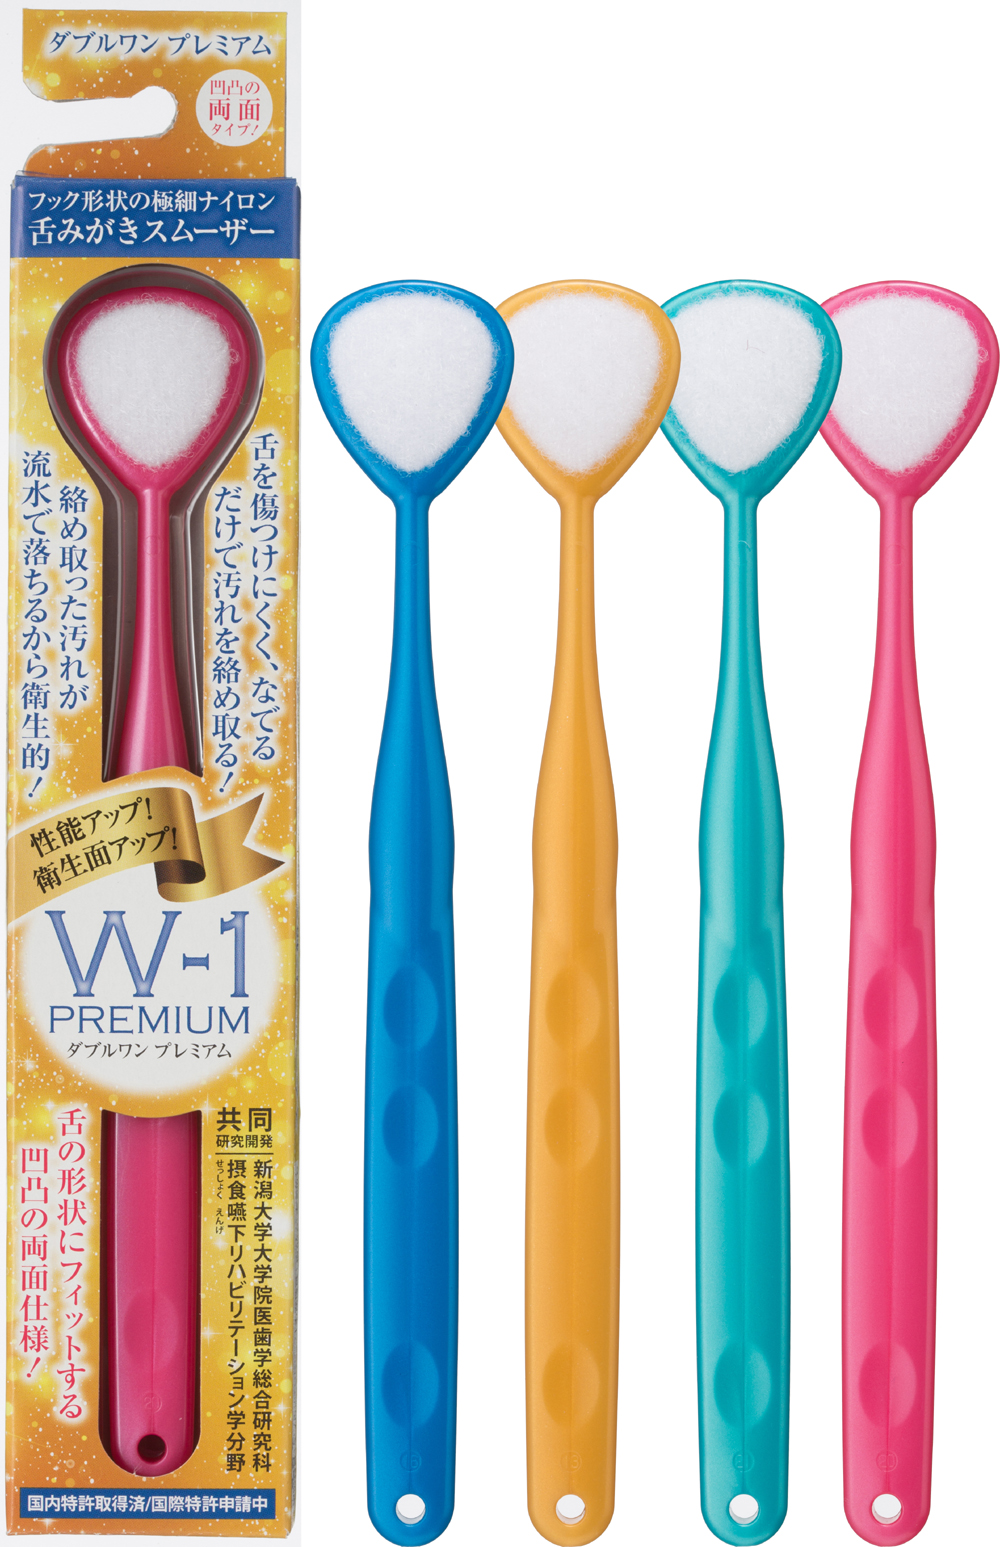 S-care tongue brush by Shikien Company